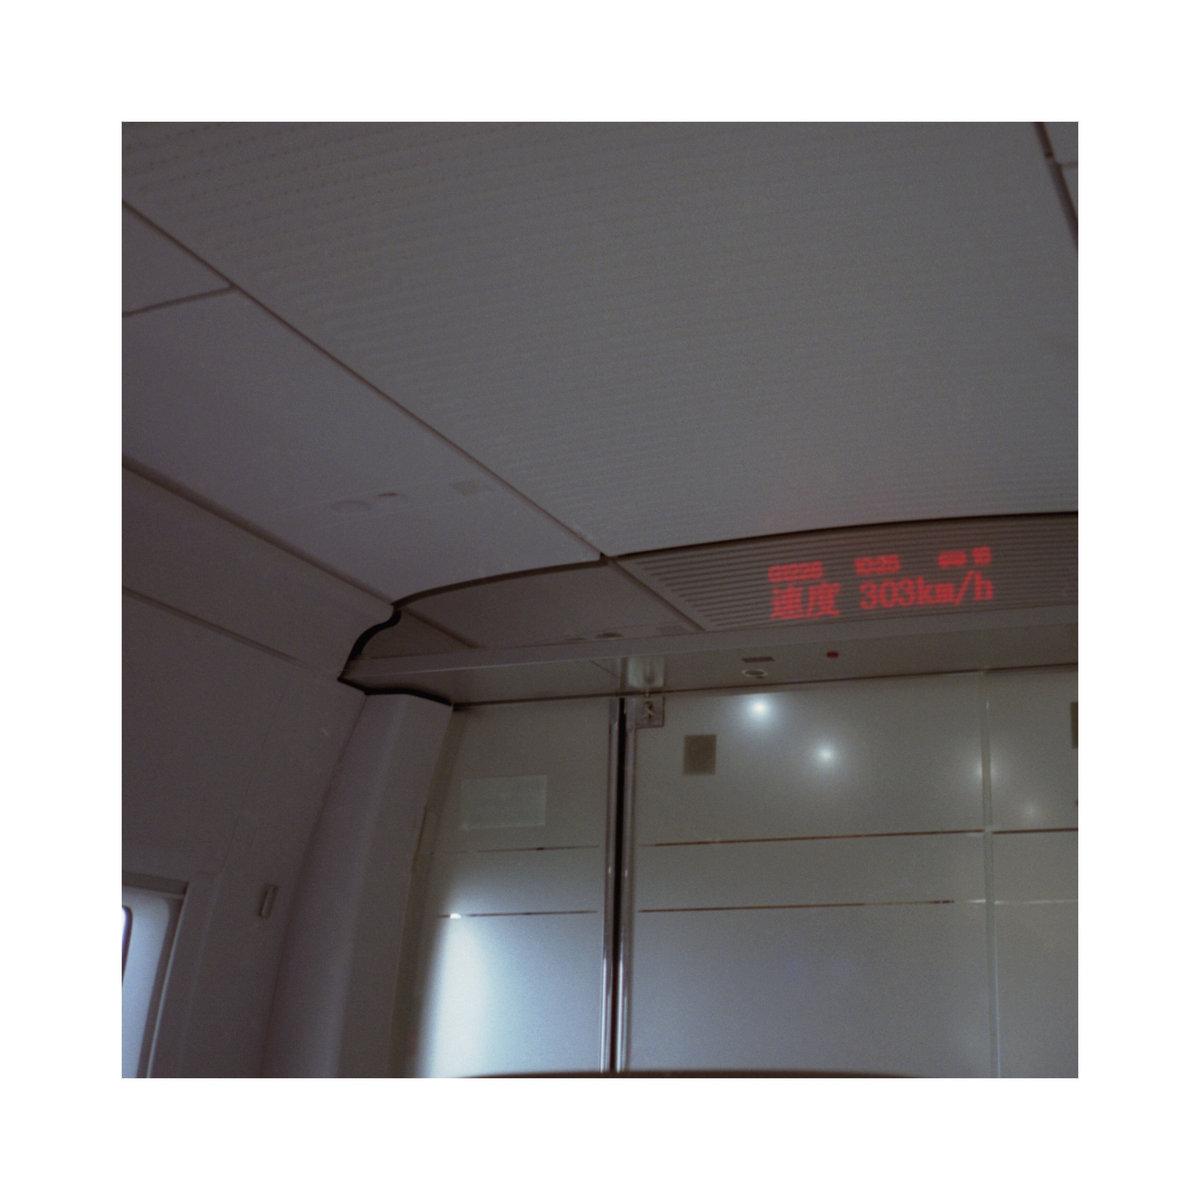 06 24 17) Birds inside the high halls of Hangzhou, (06 23 17